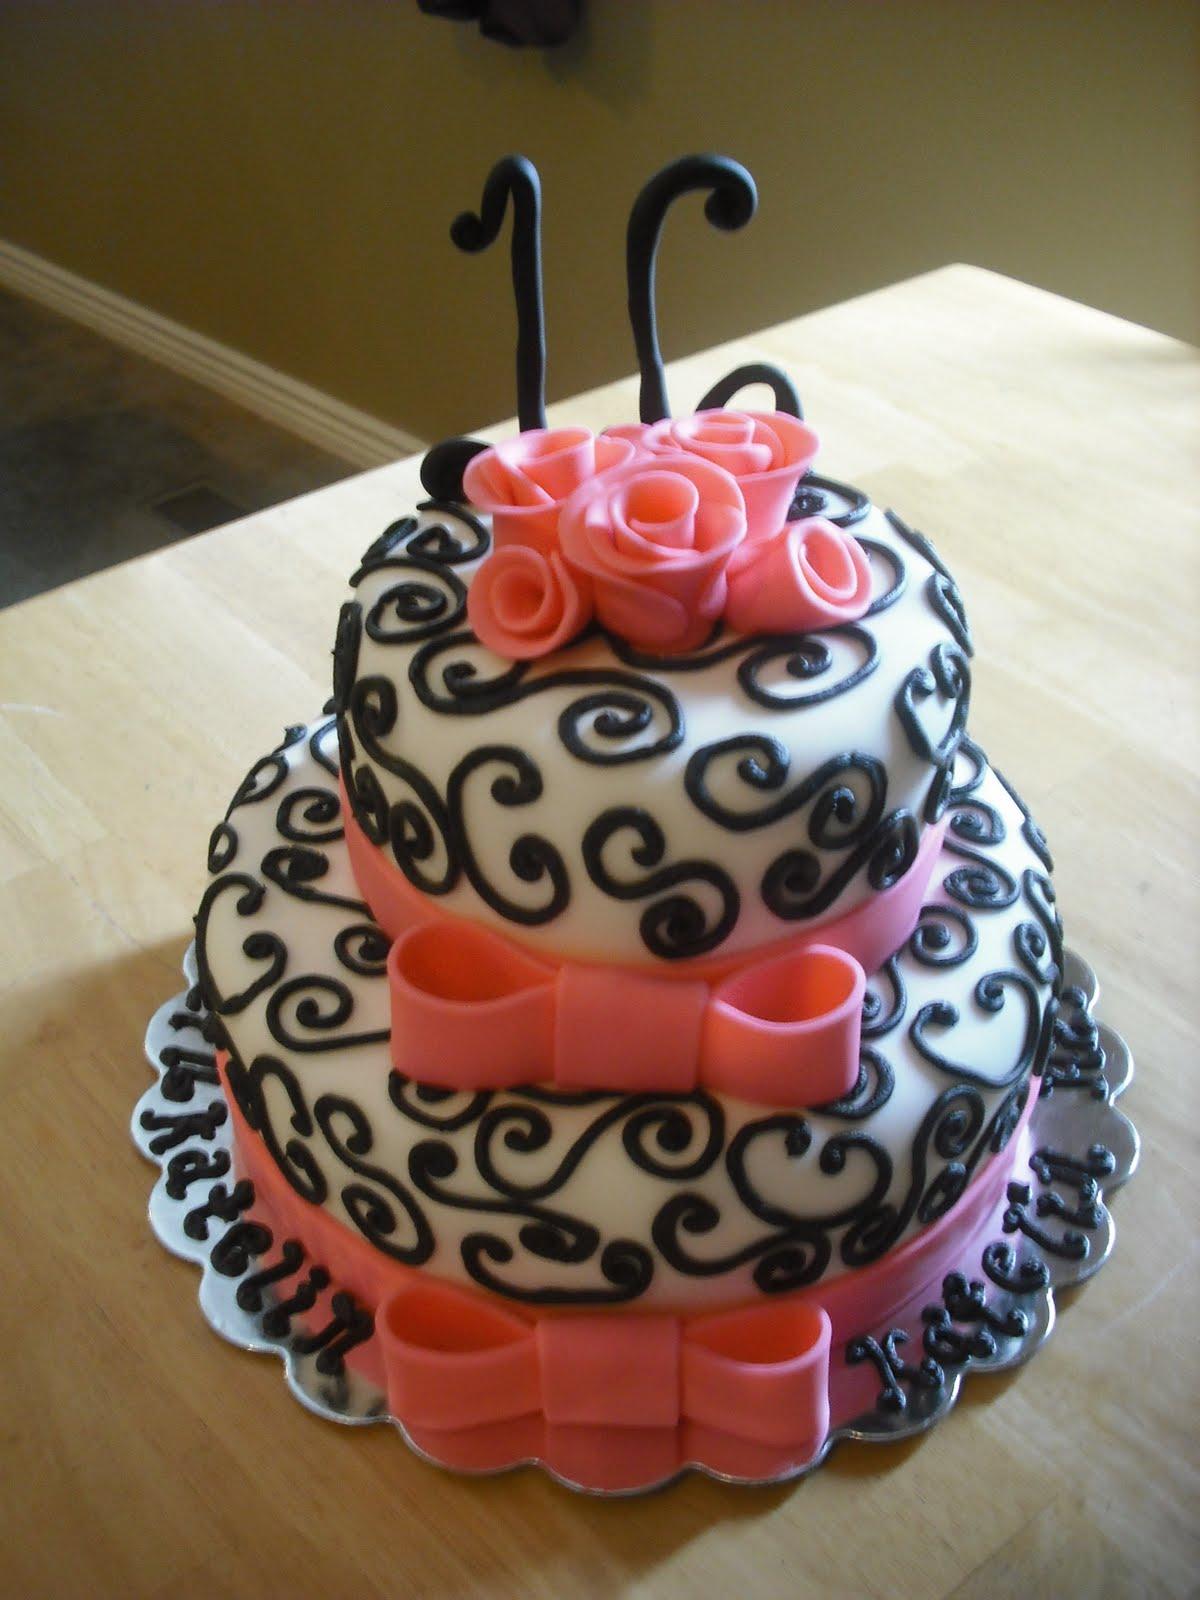 Birthday Cake Ideas With Sweets : Sprinklebelle Cakes: Sweet 16 Cake